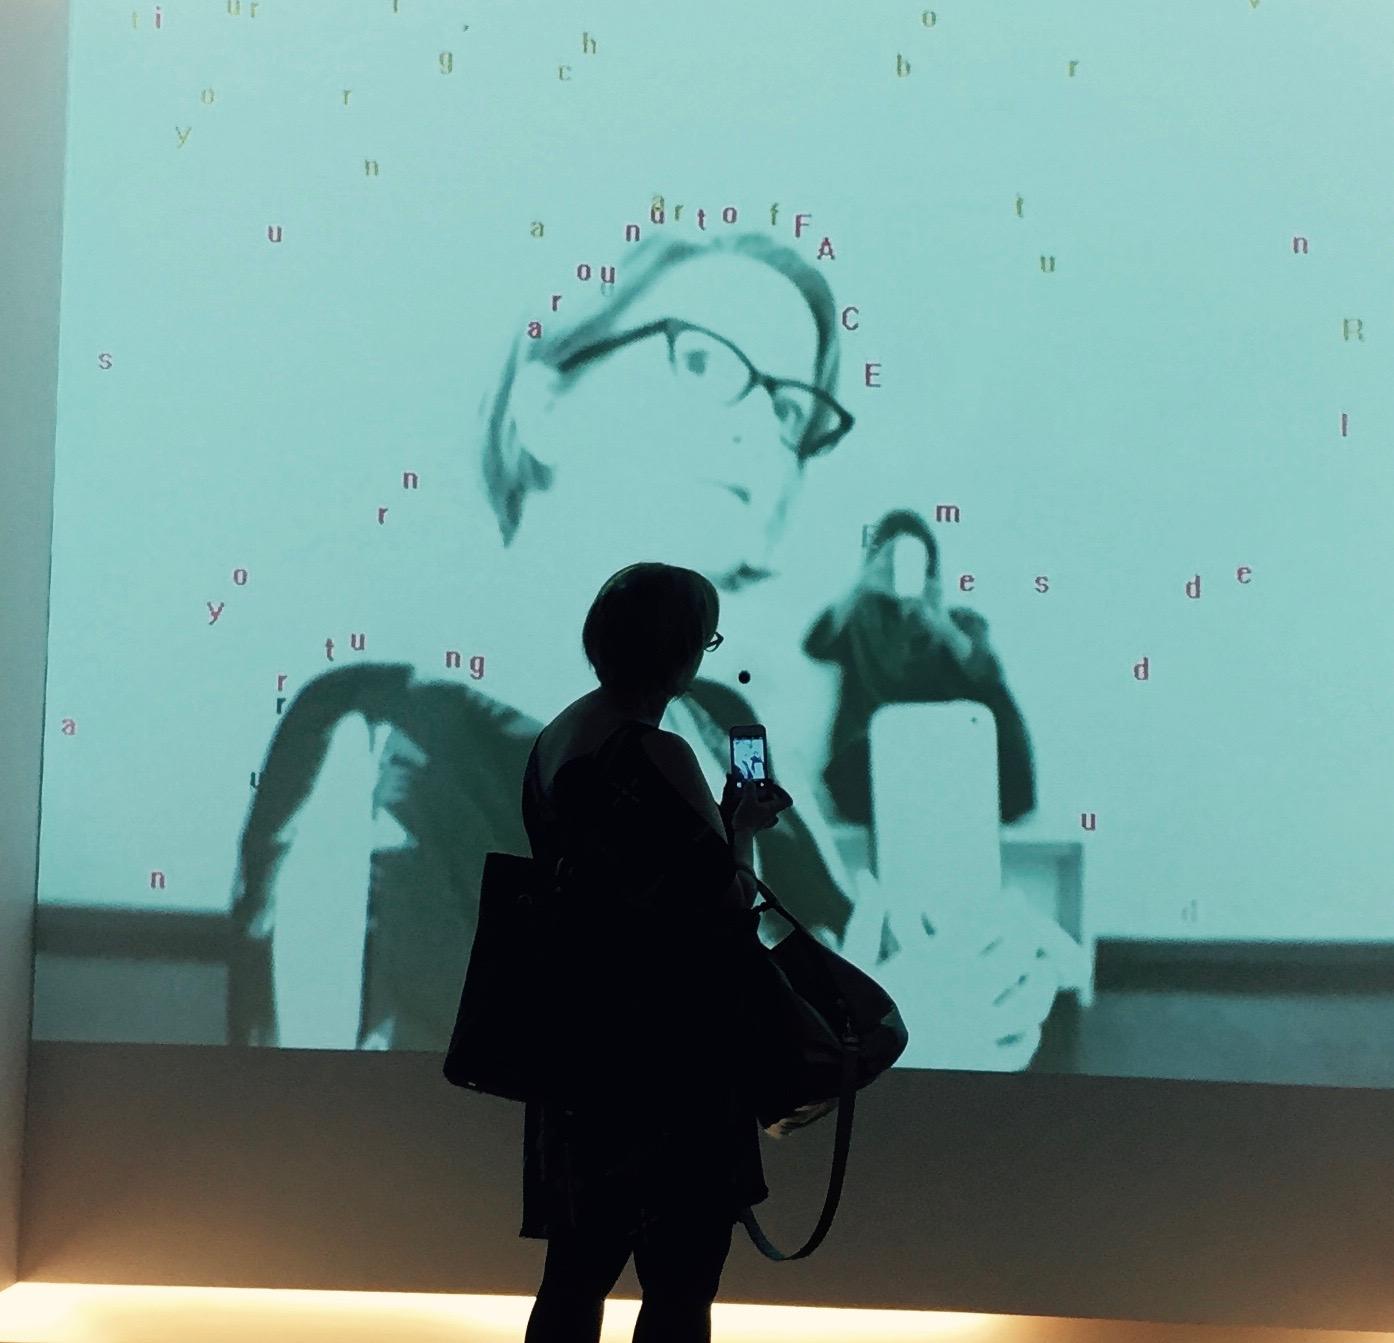 Digital art interaction at the 21C hotel, Louisville